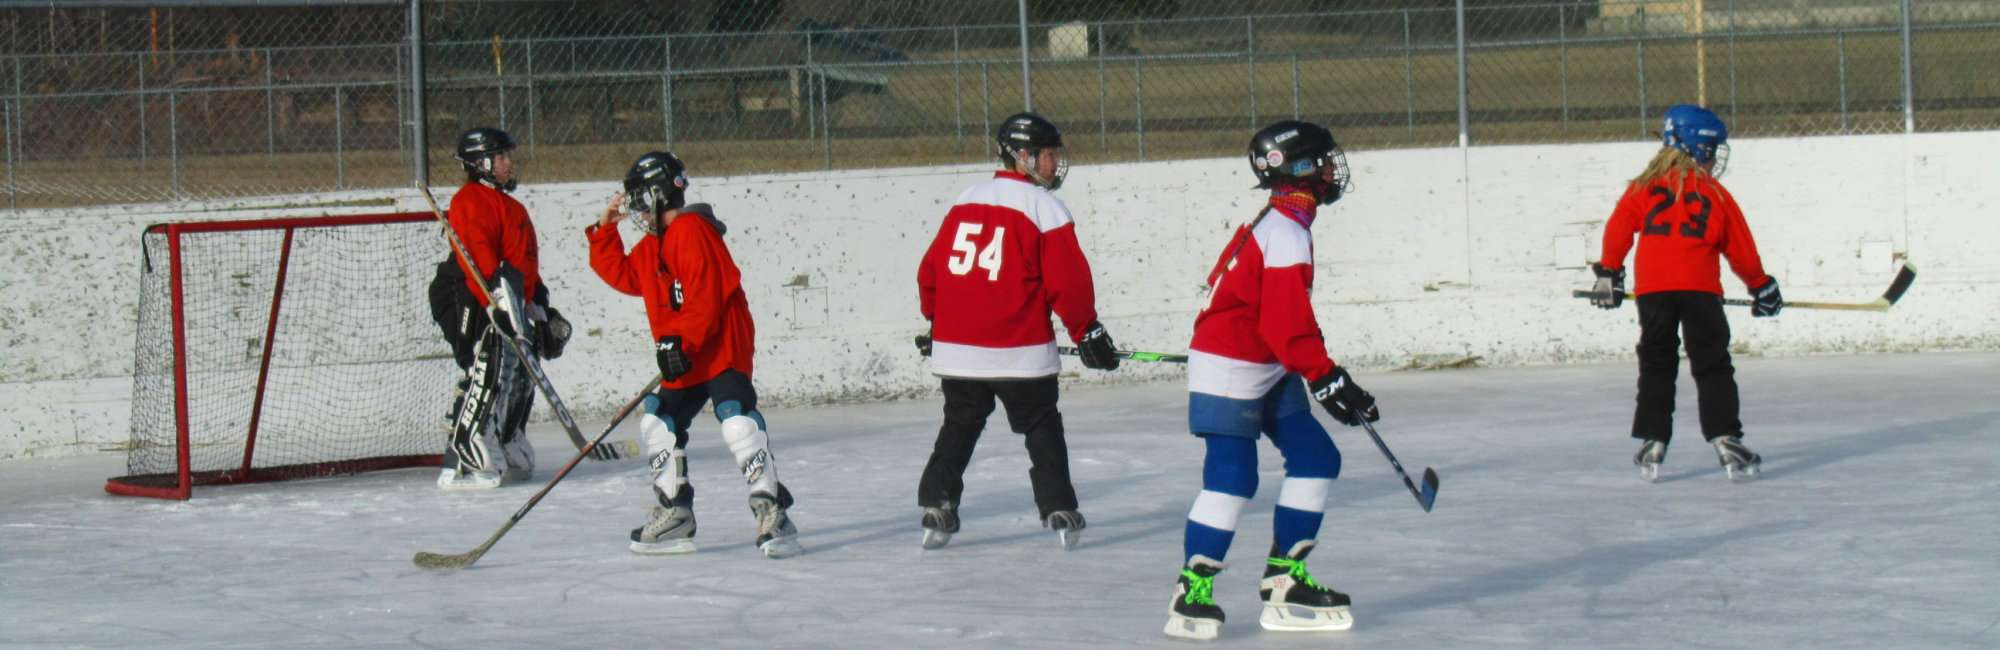 Slide-Recreation-Hockey